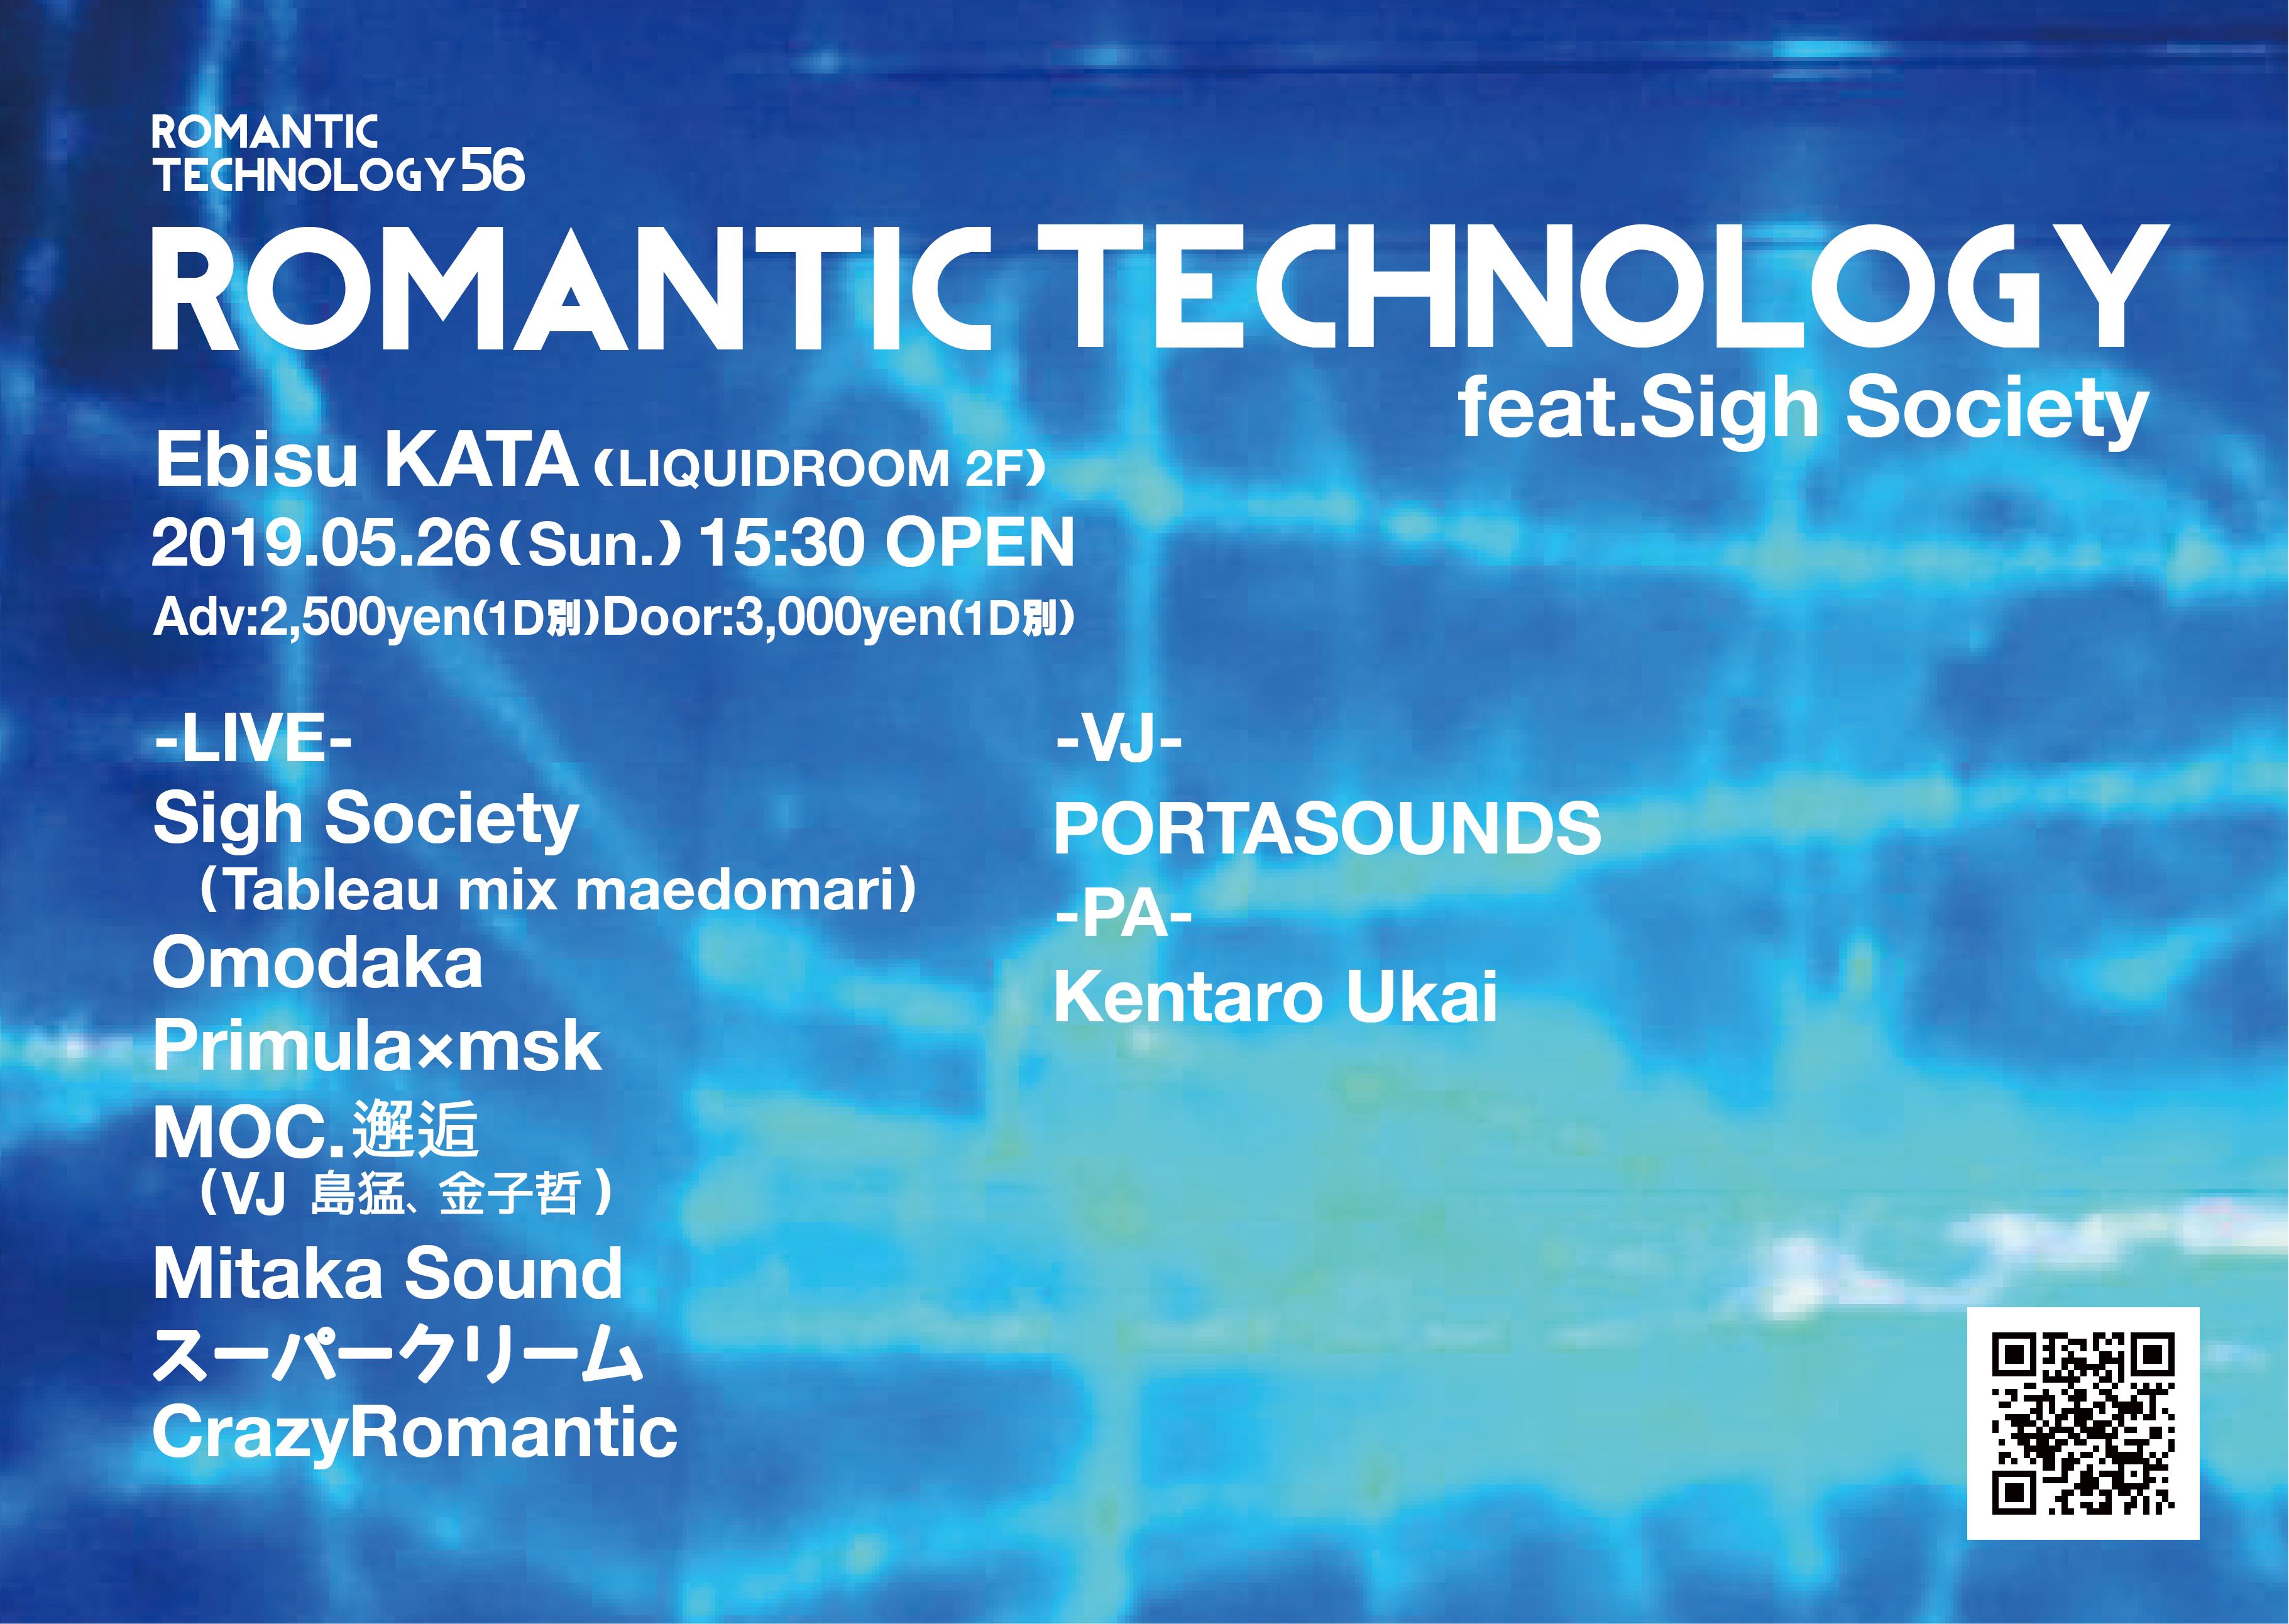 ROMANTIC TECHNOLOGY